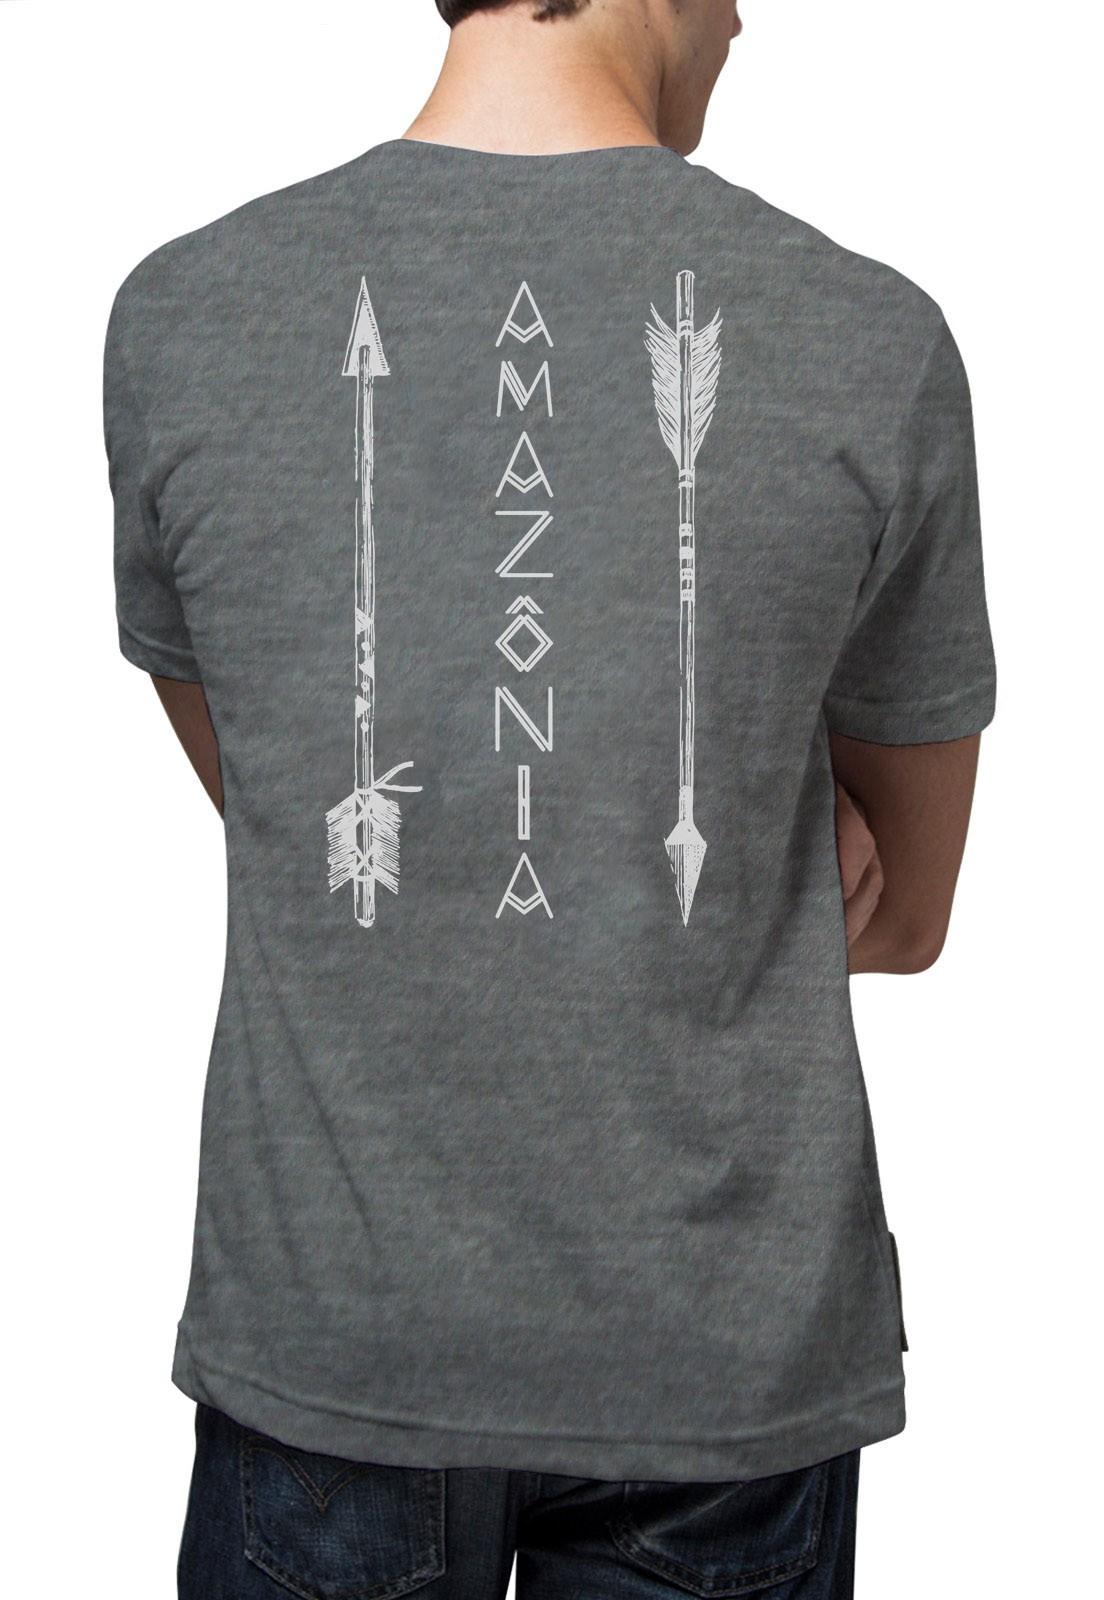 Camiseta Amazônia Flechas - Cinza Mescla